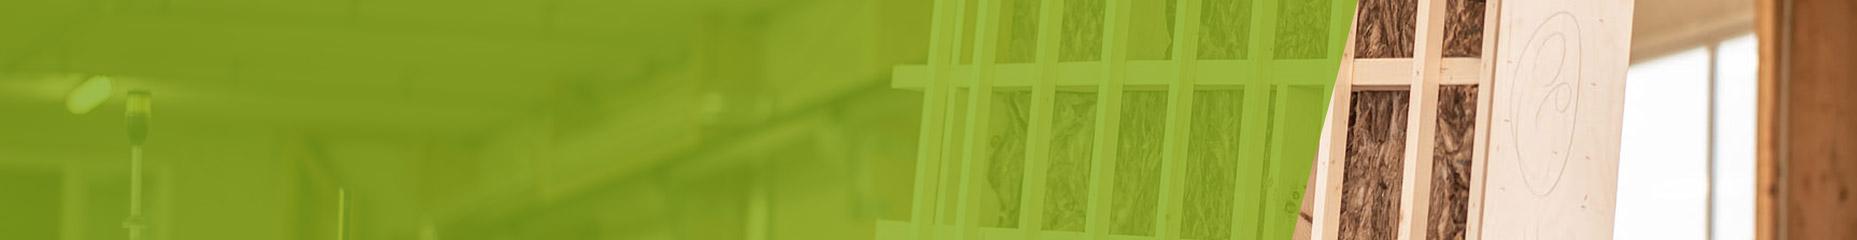 drevostavebni-panely-timeline-1